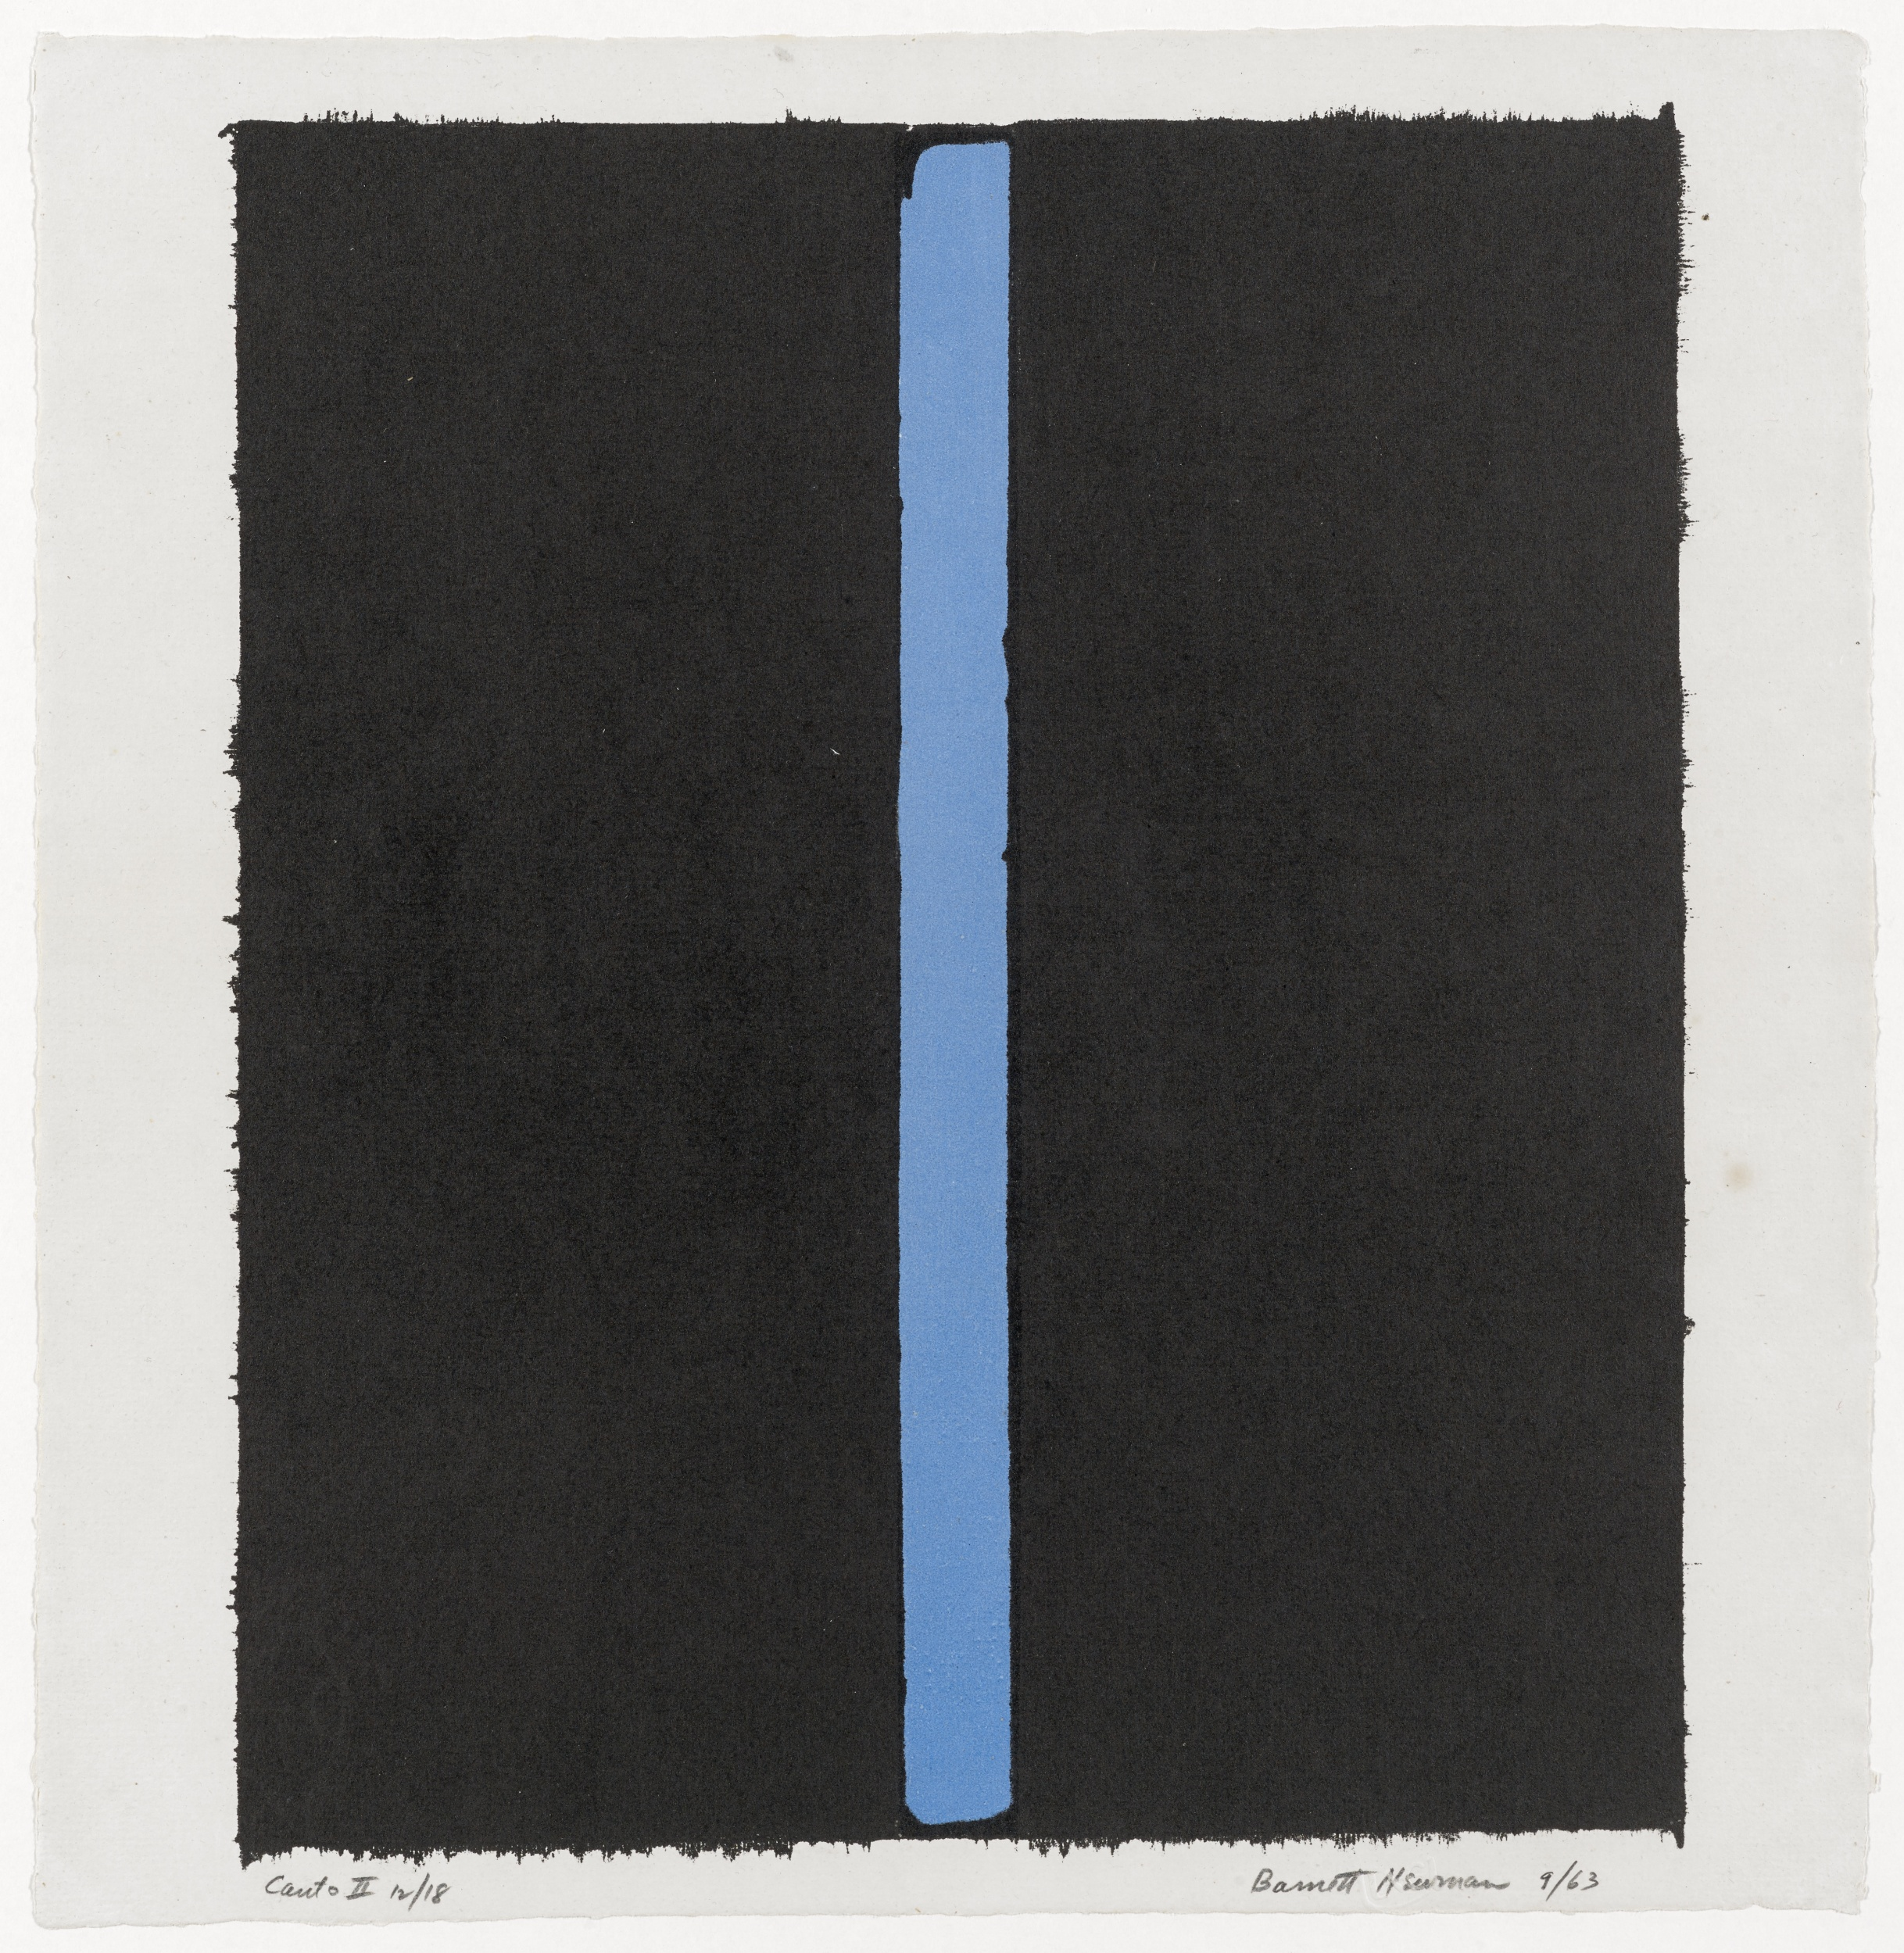 Barnett Newman (1905–1970); Canto II; Sep-1963